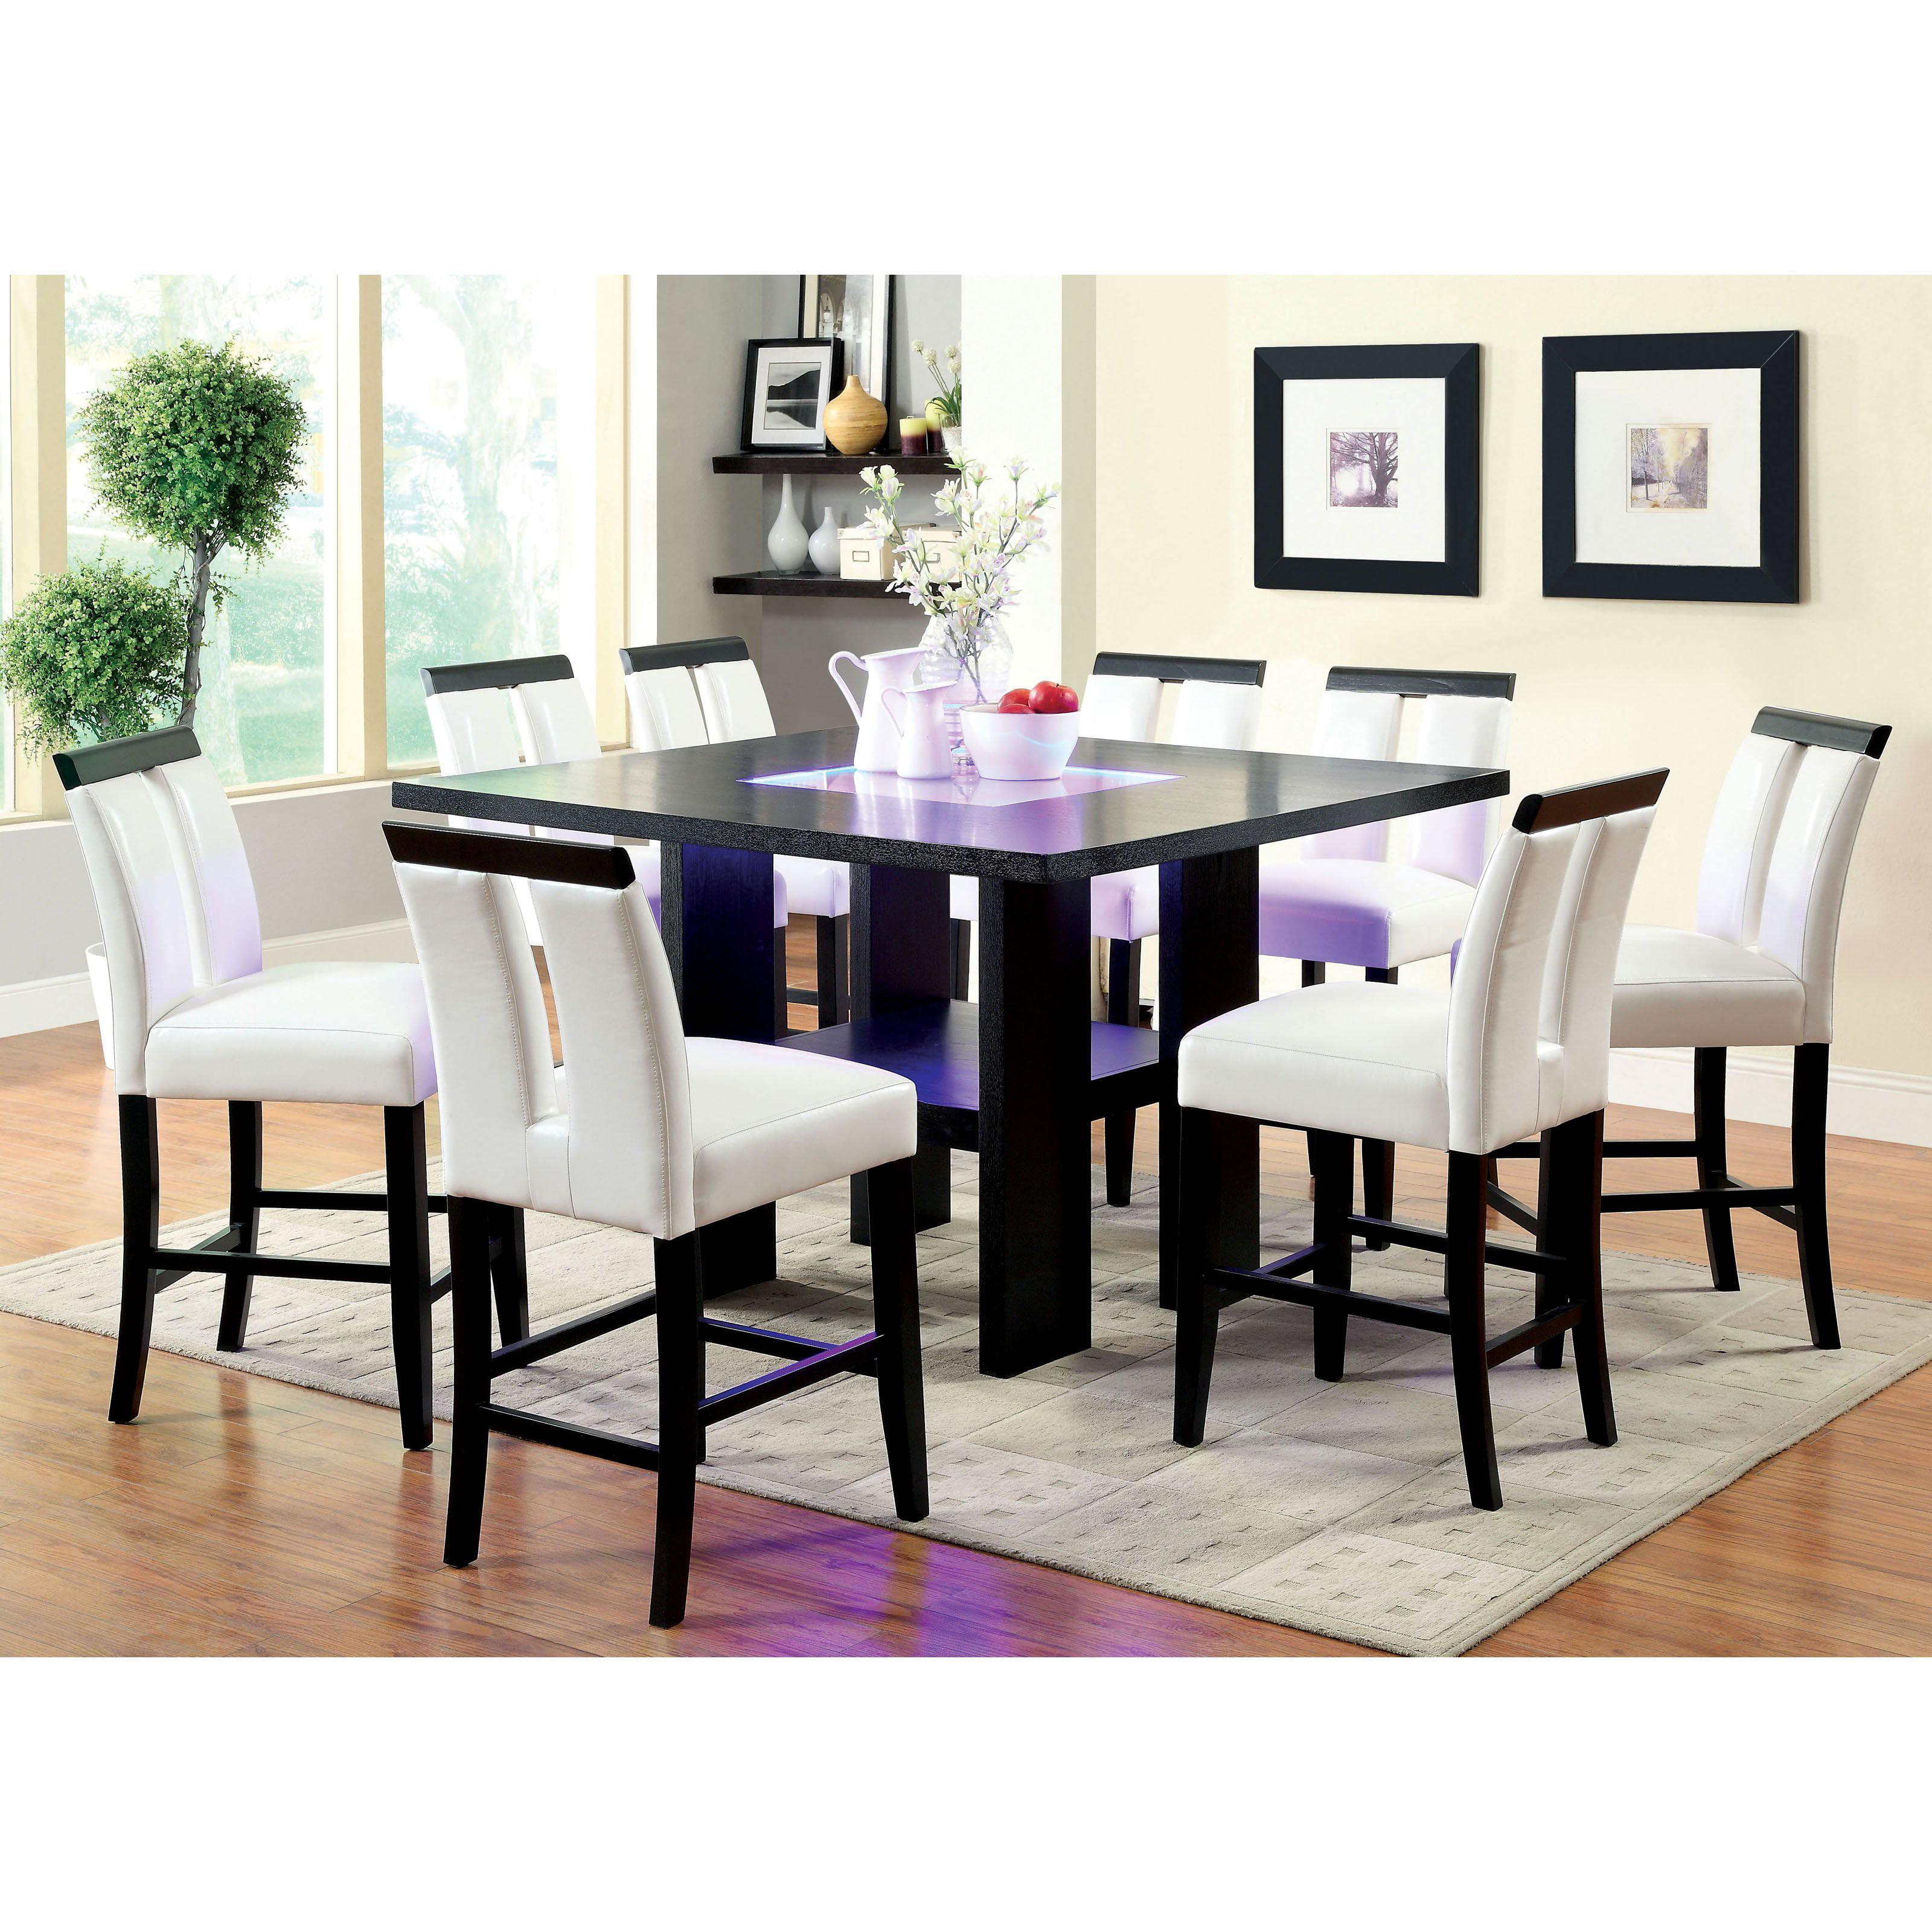 Furniture of America Luminate Contemporary 9 Piece Illuminating Counter  Height Dining Set